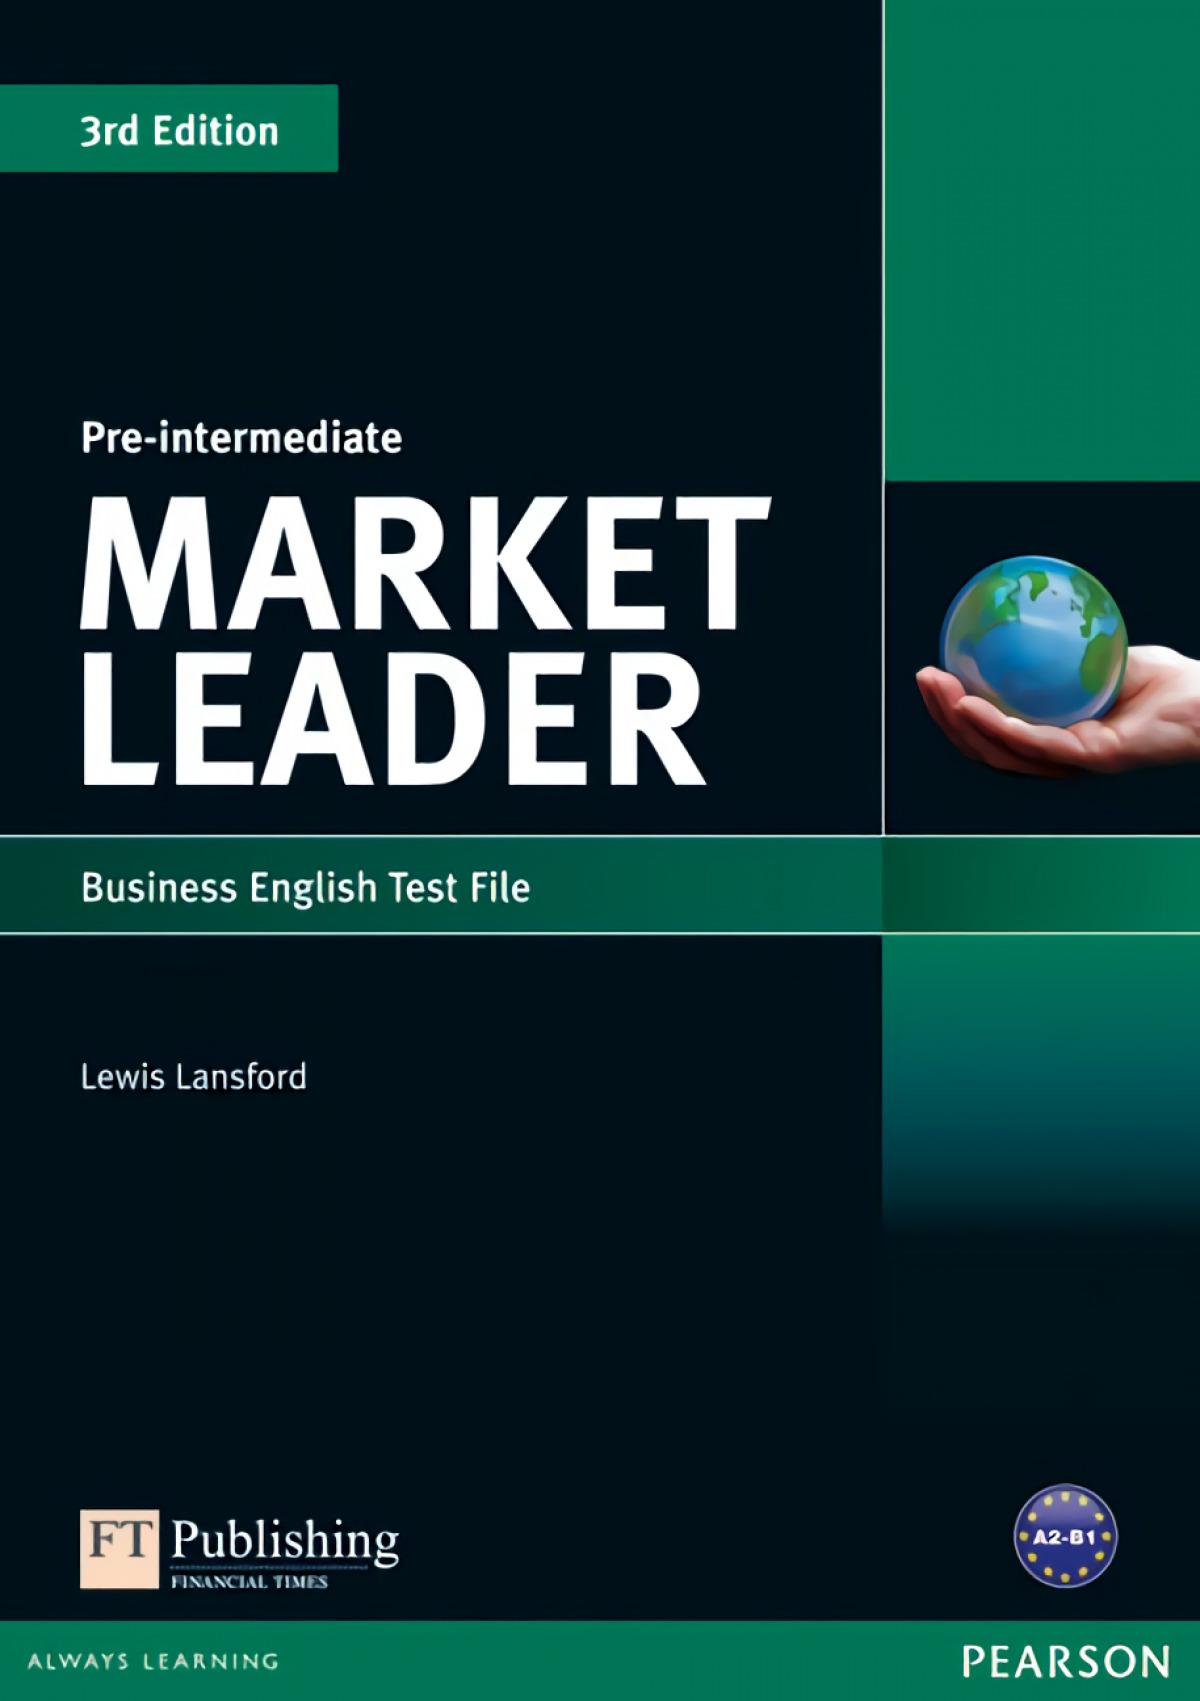 Market Leader 3rd edition Pre-Intermediate Test File